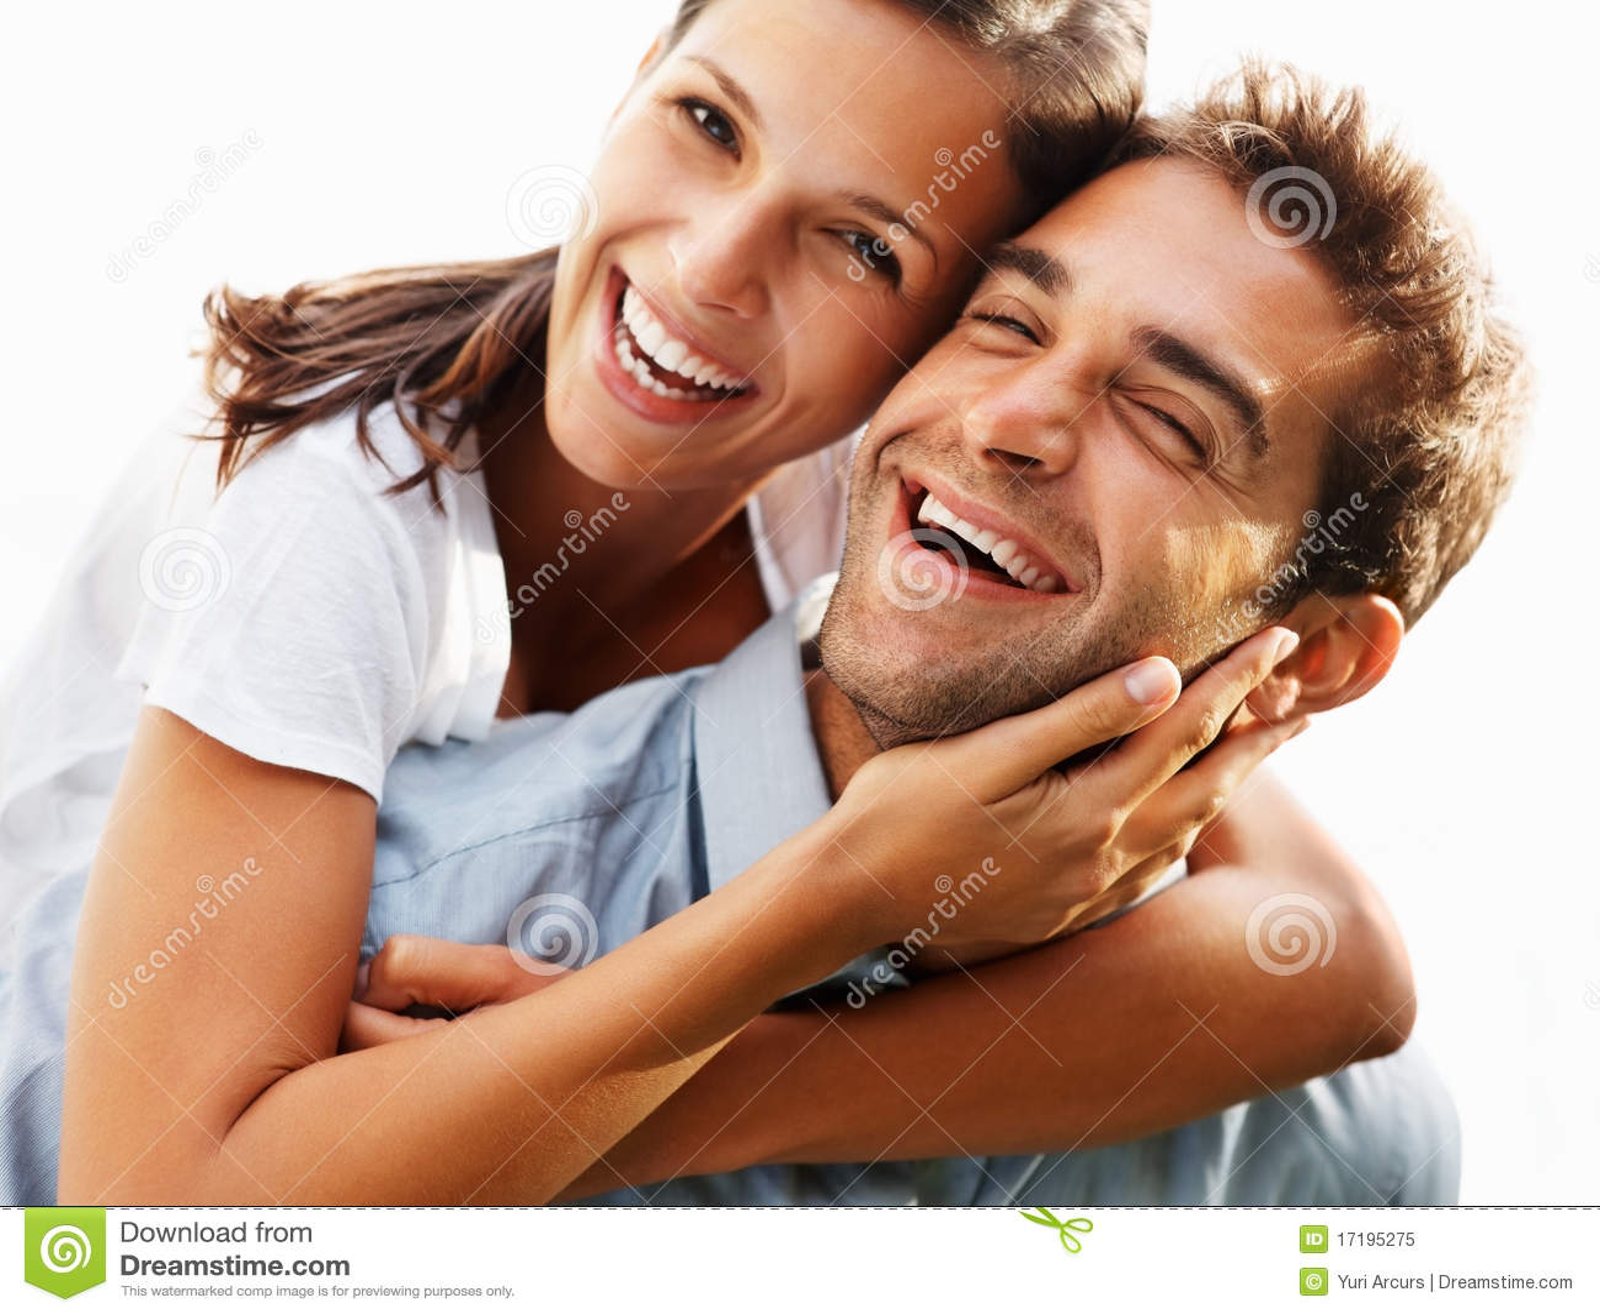 Couple Enjoying Their Summer Holidays Stock Photo: Royalty Free Stock Photo: Fun-loving Couple Enjoying Life